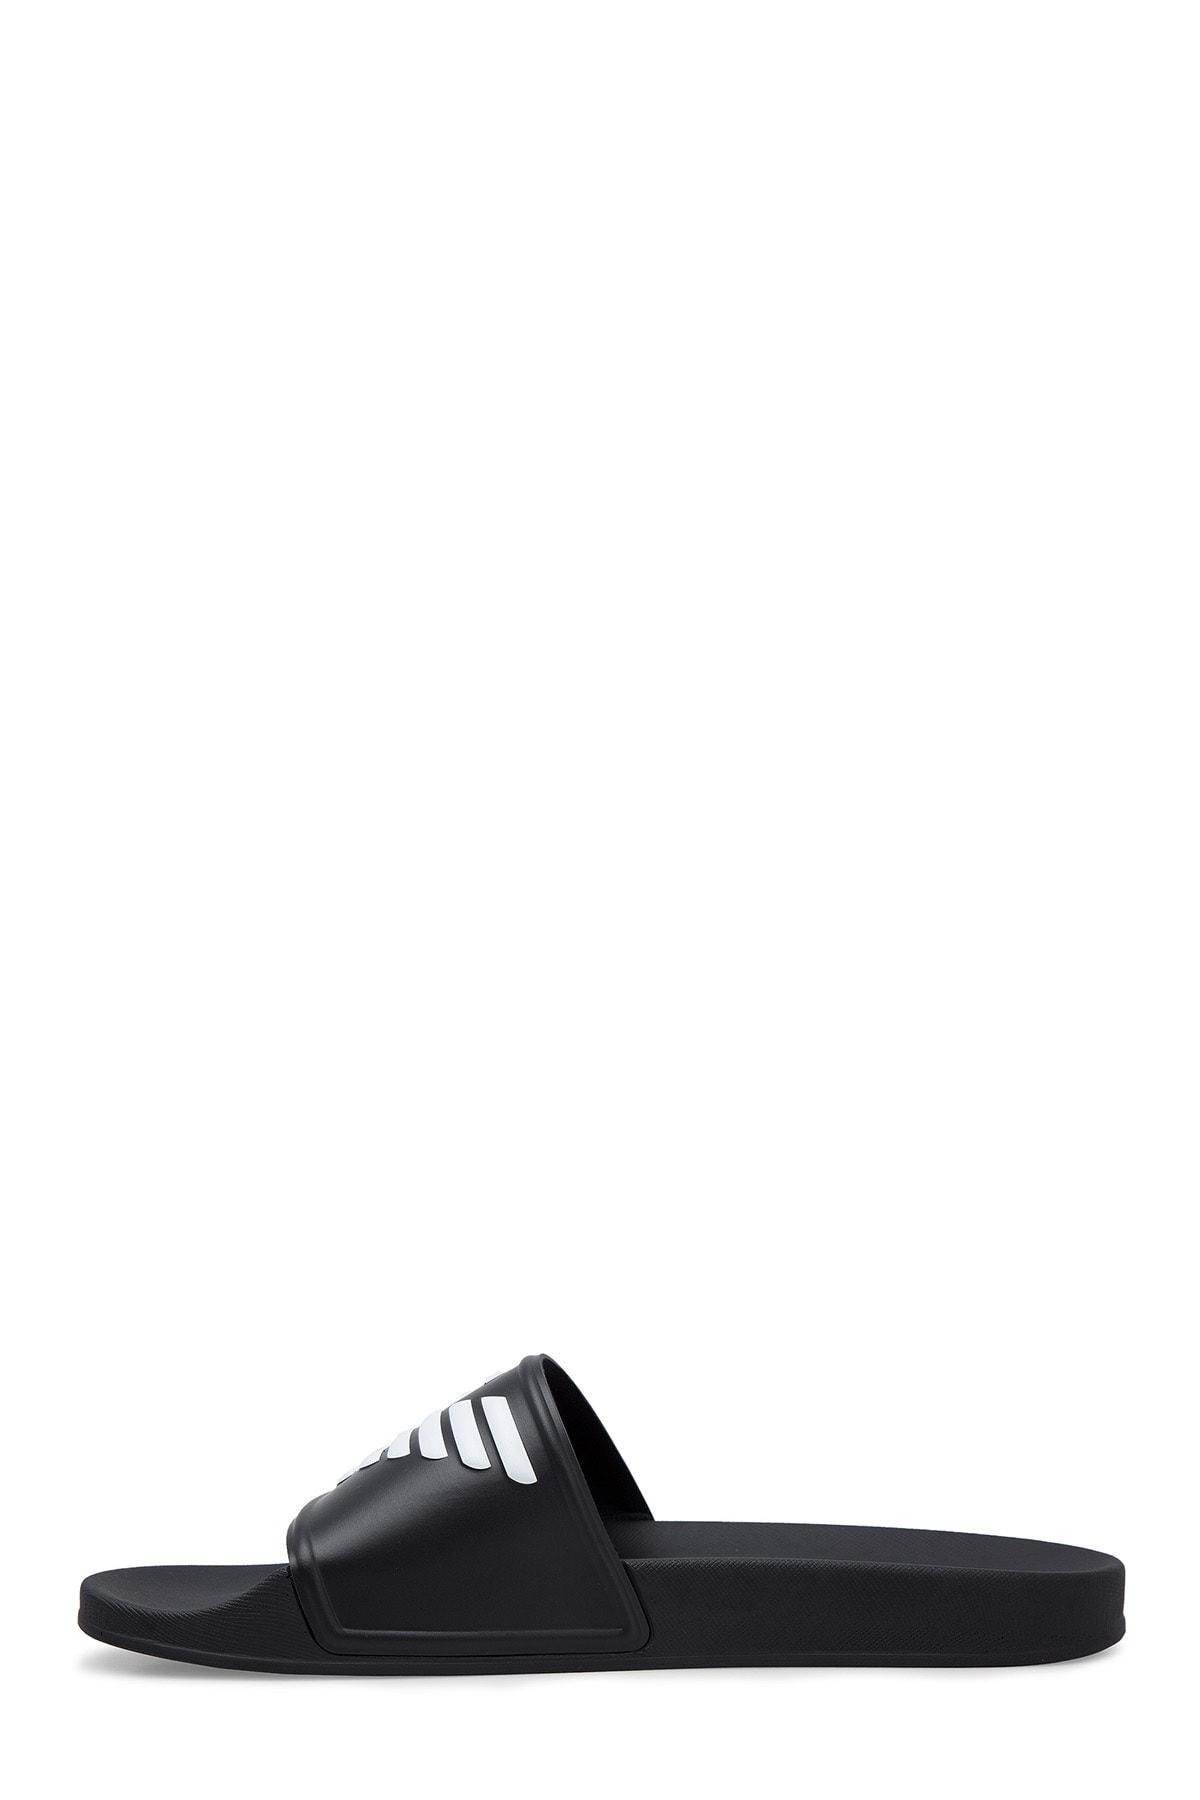 Emporio Armani Terlik Erkek Terlik X4ps01 Xl828 A120 2